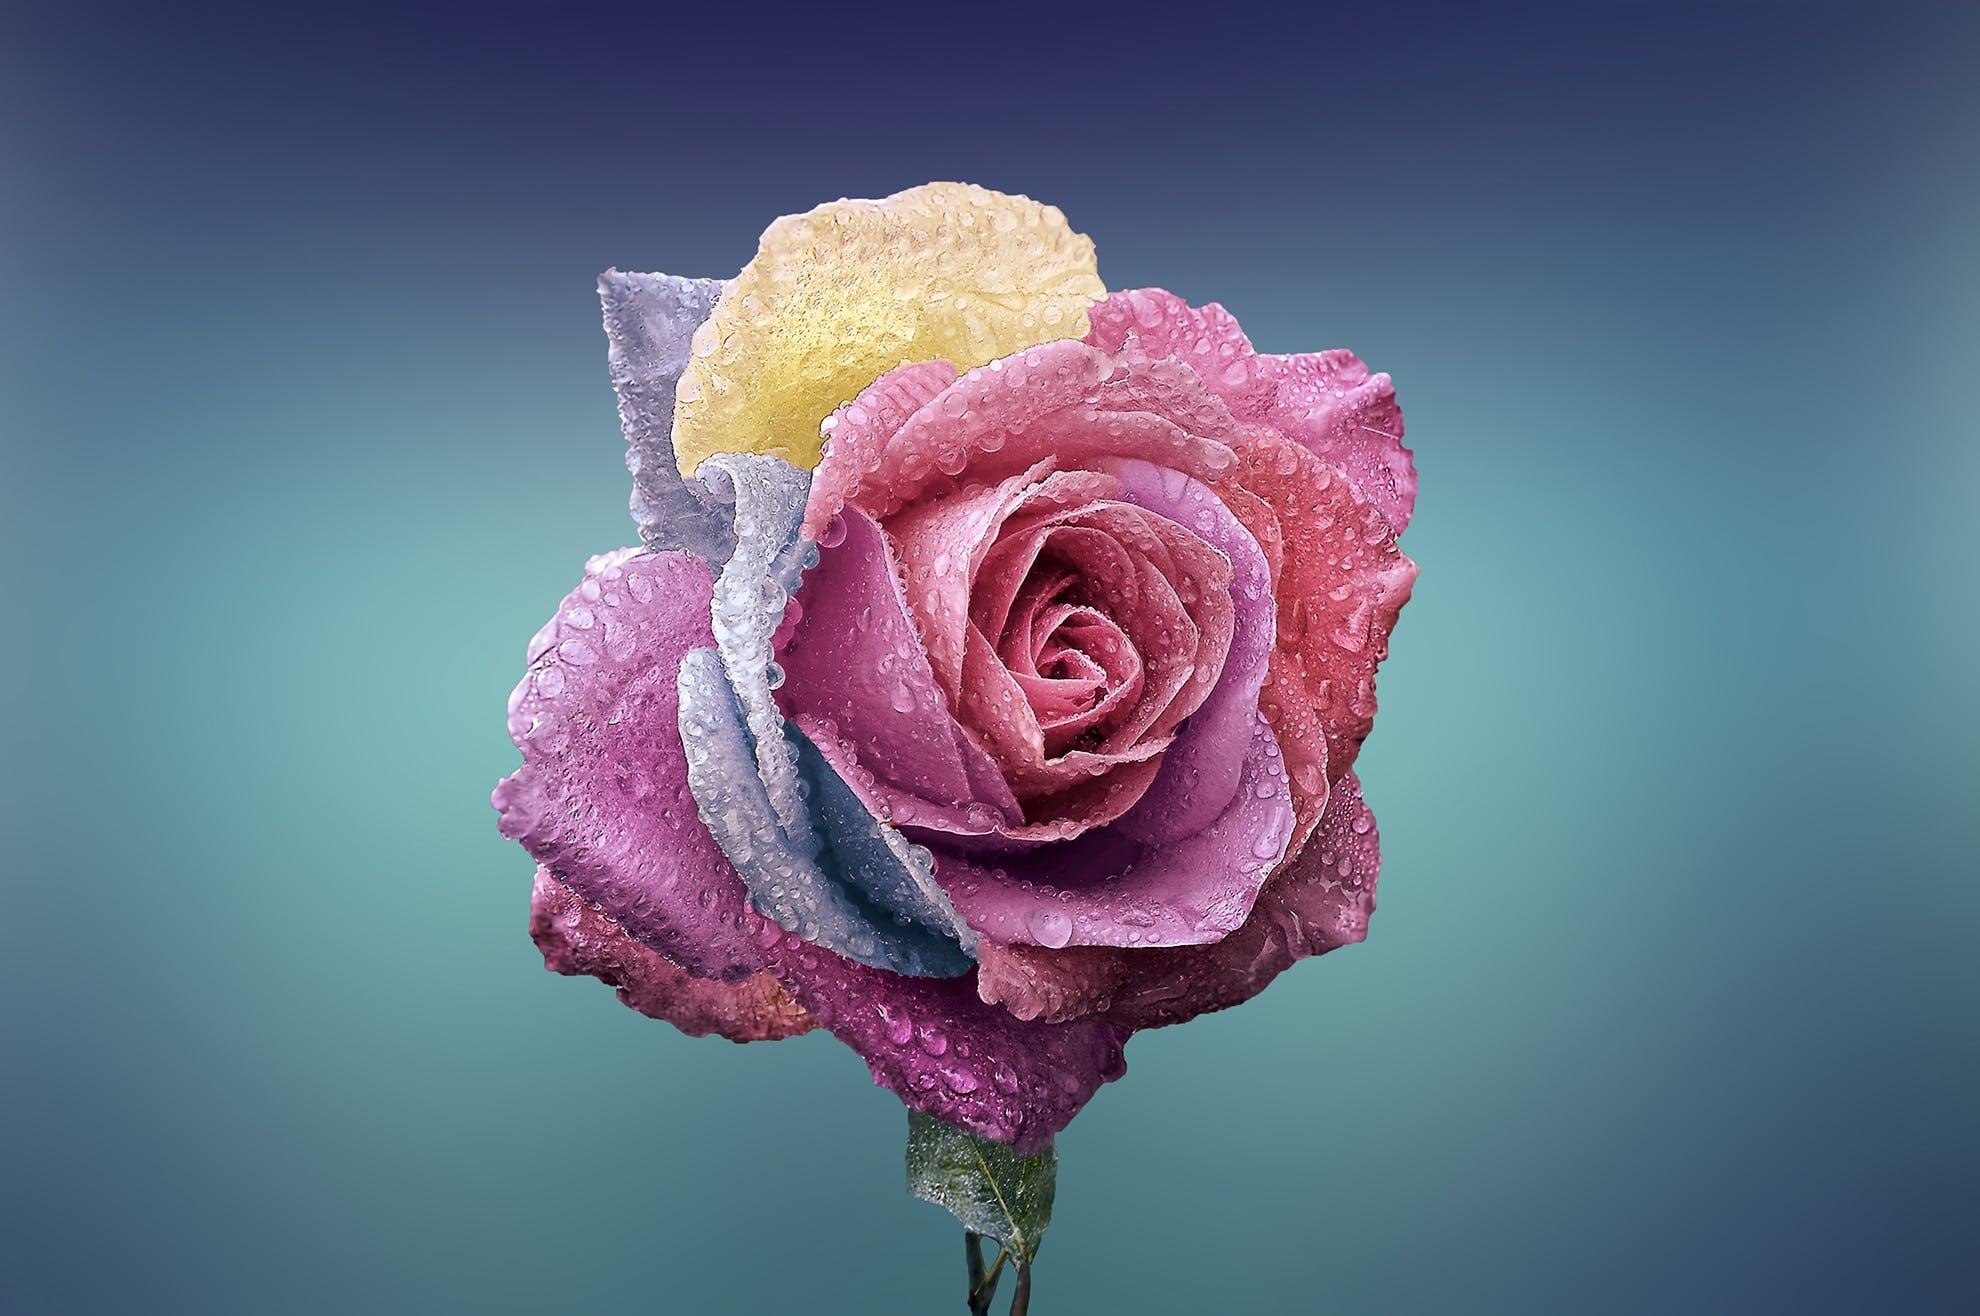 bloom, blossom, close-up